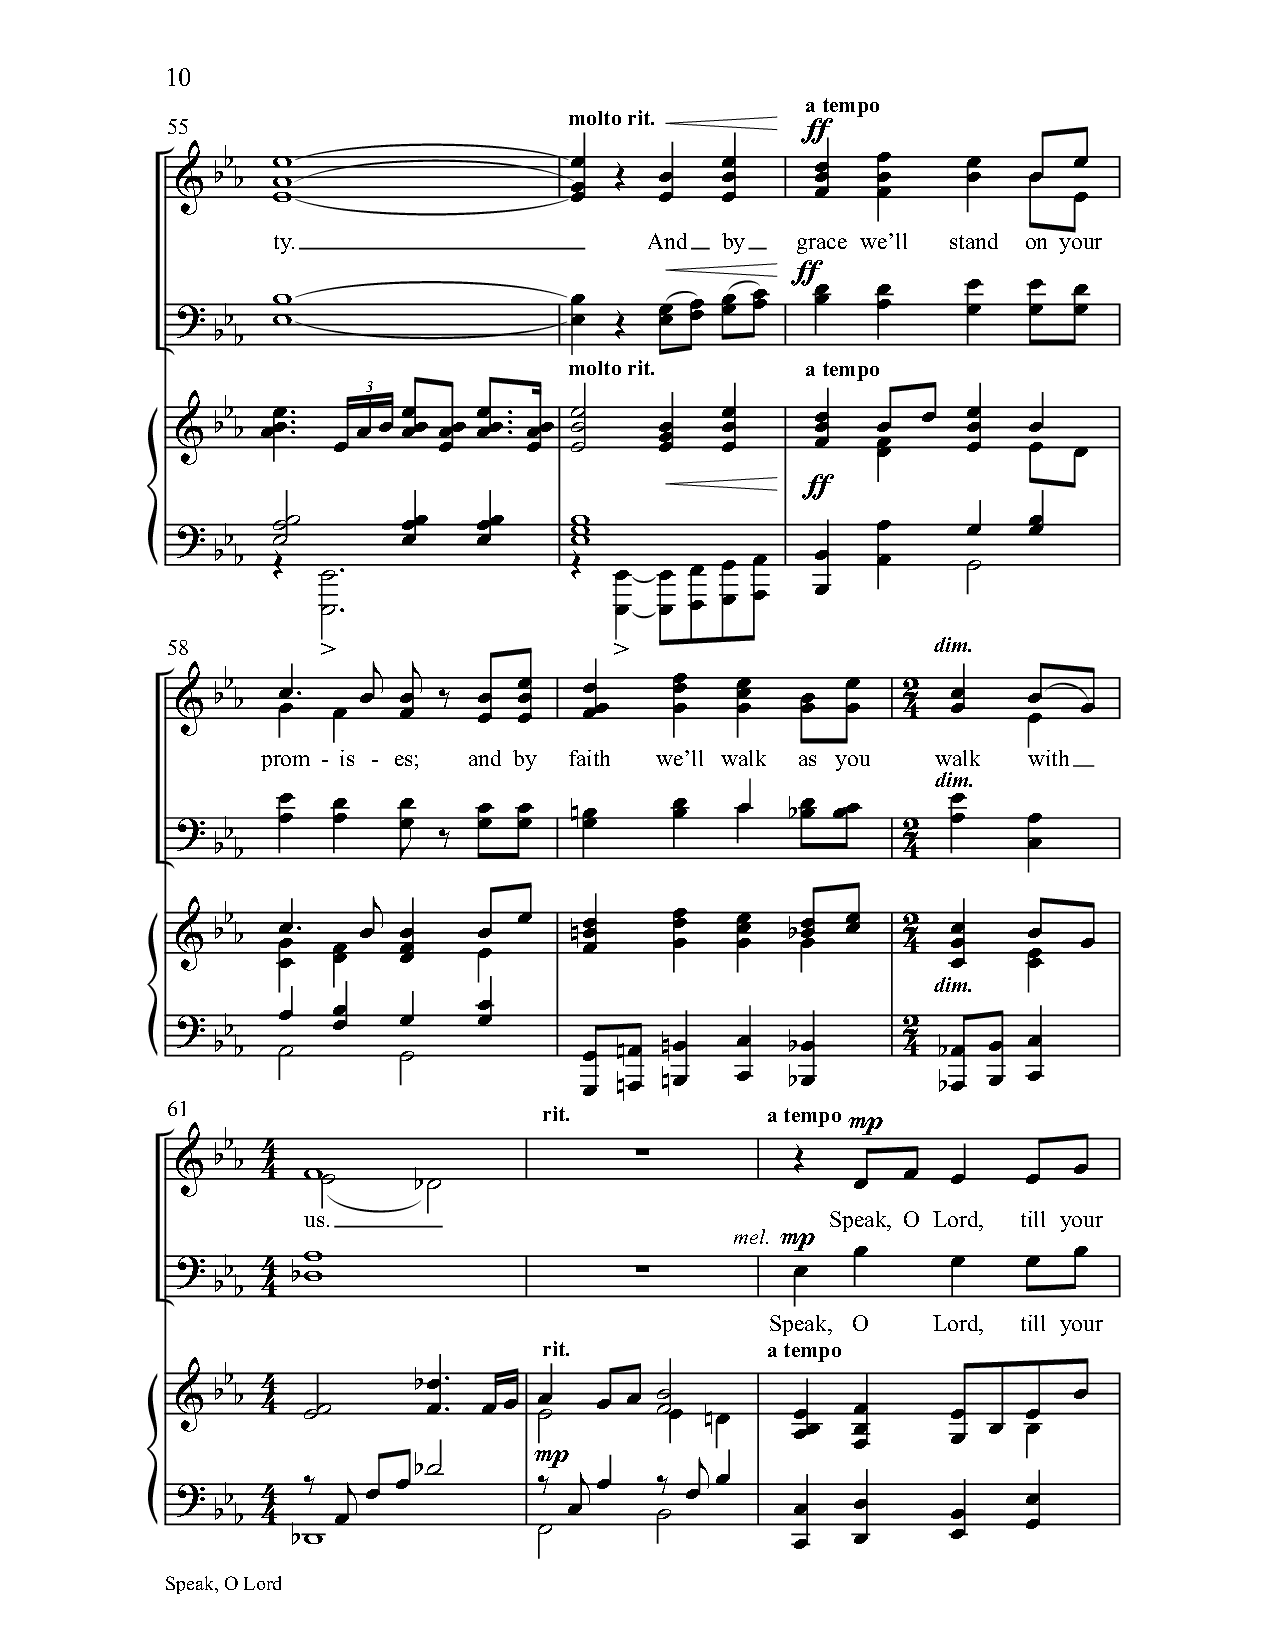 Speak O Lord Satb By Keith Getty Stuar Jw Pepper Sheet Music